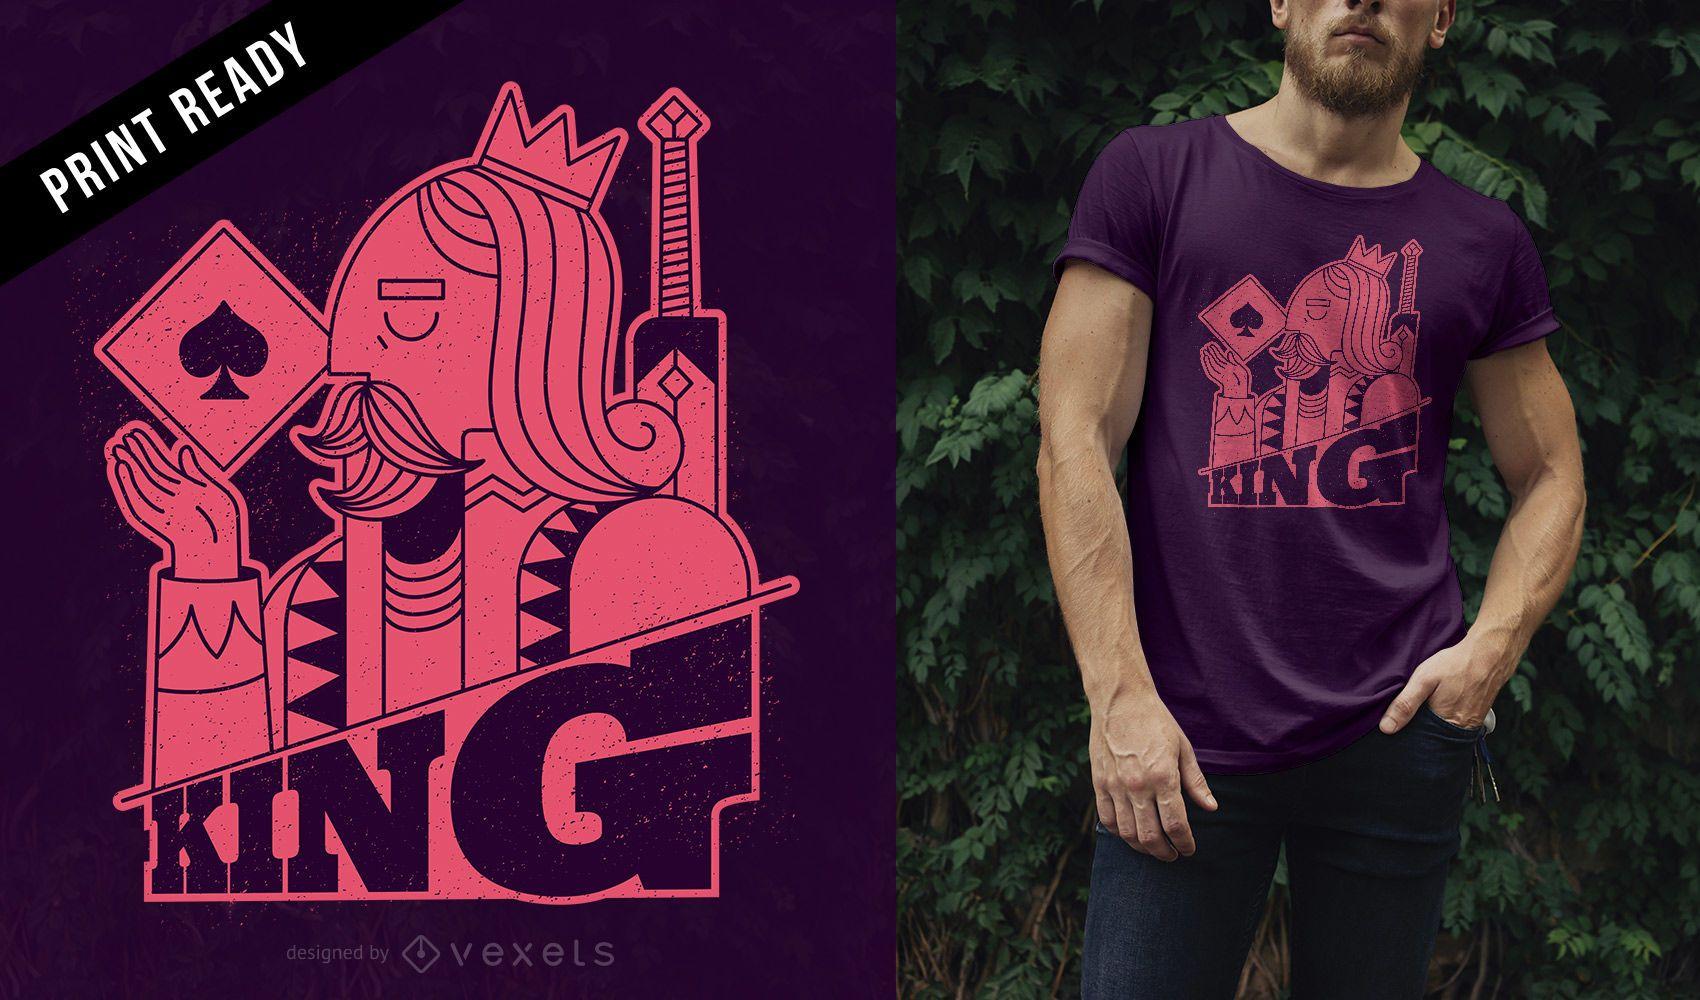 King card t-shirt design